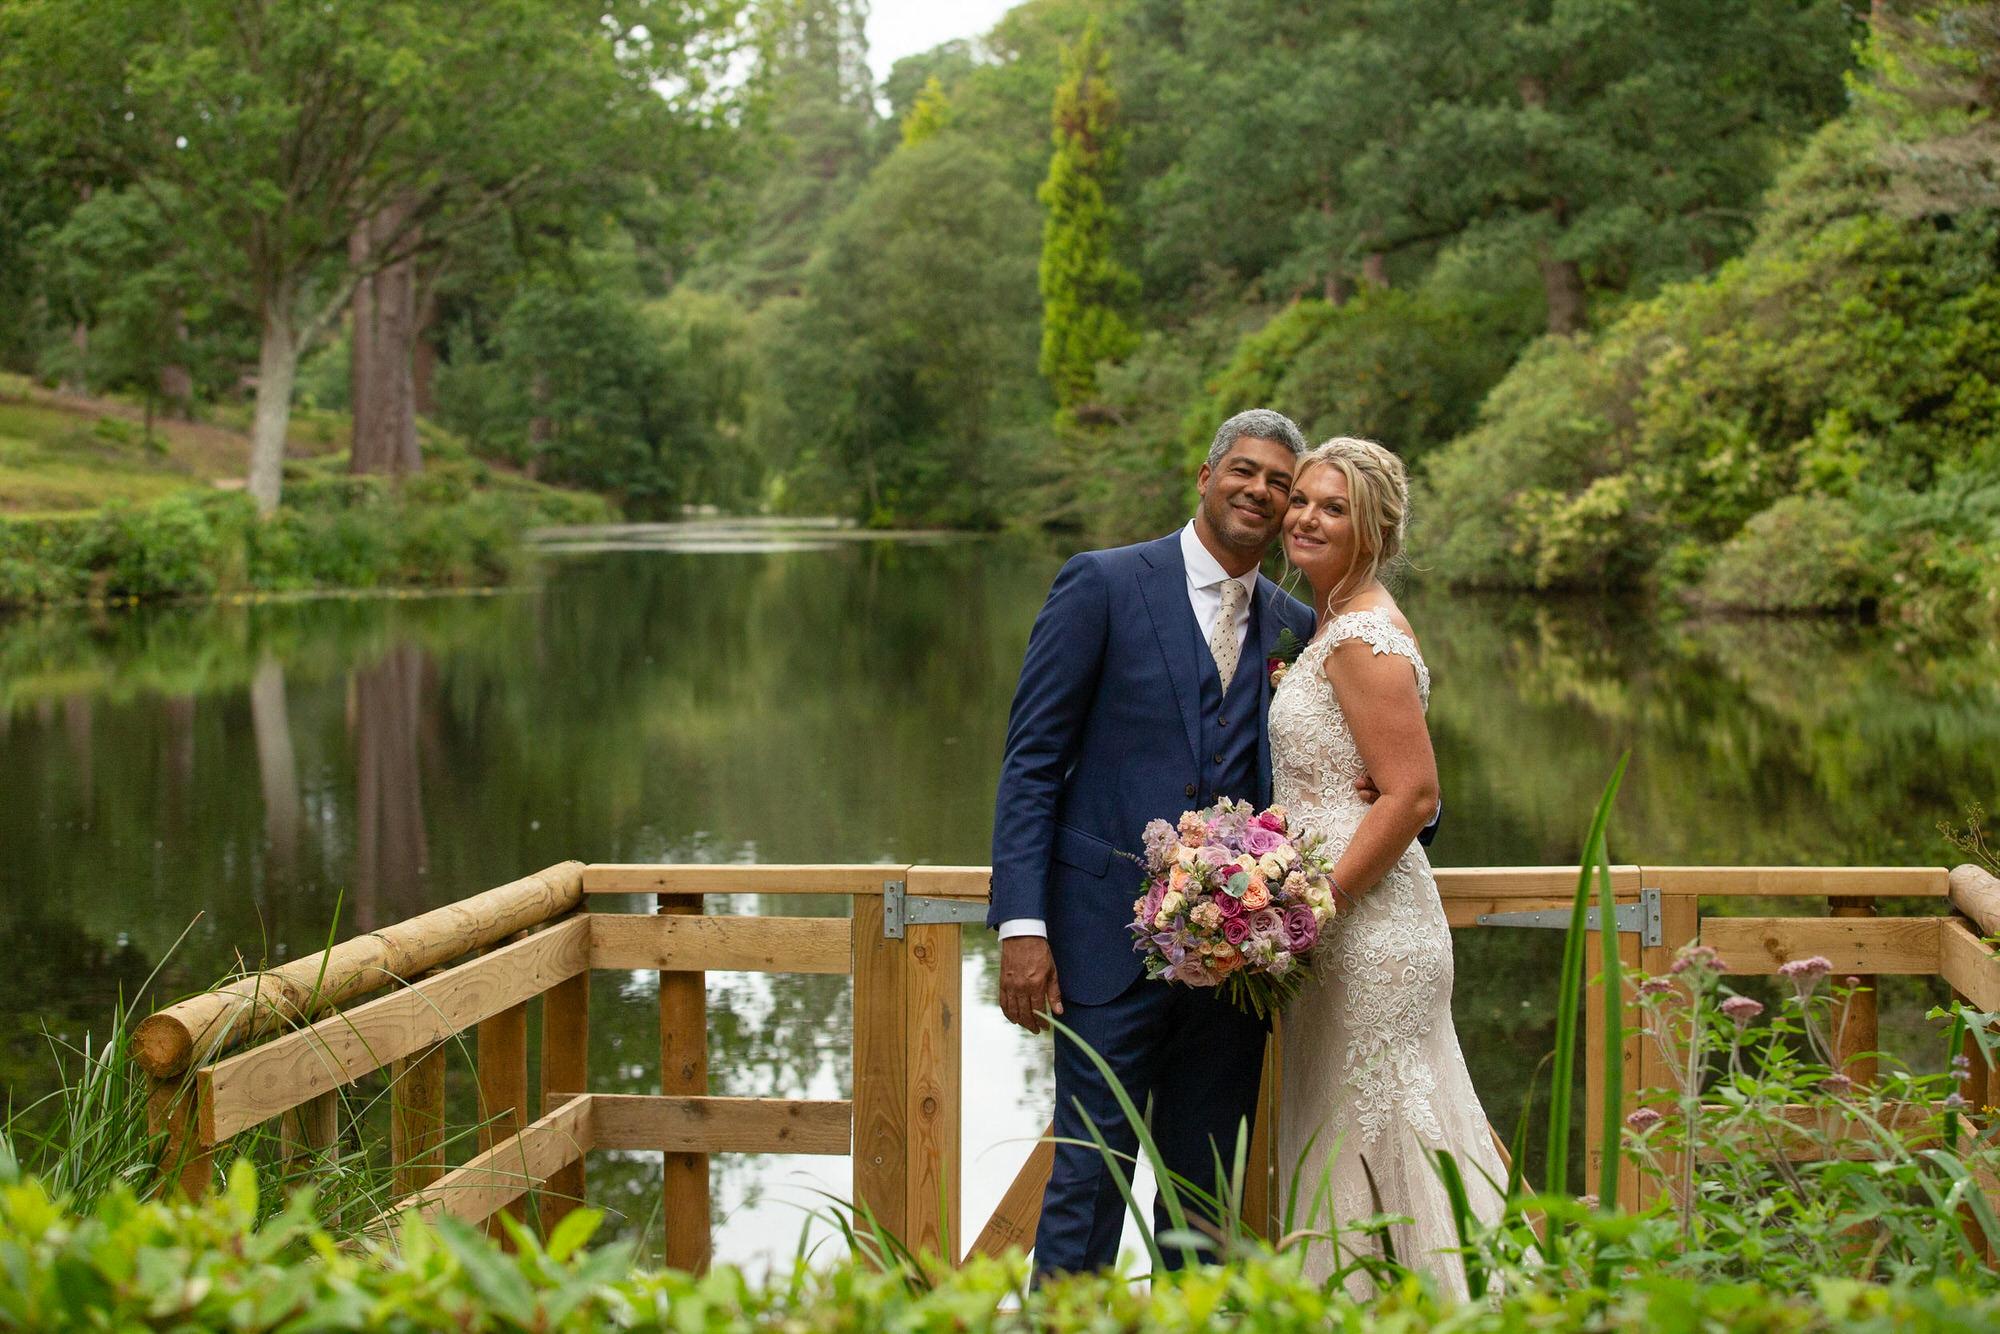 Leonardslee garden weddings